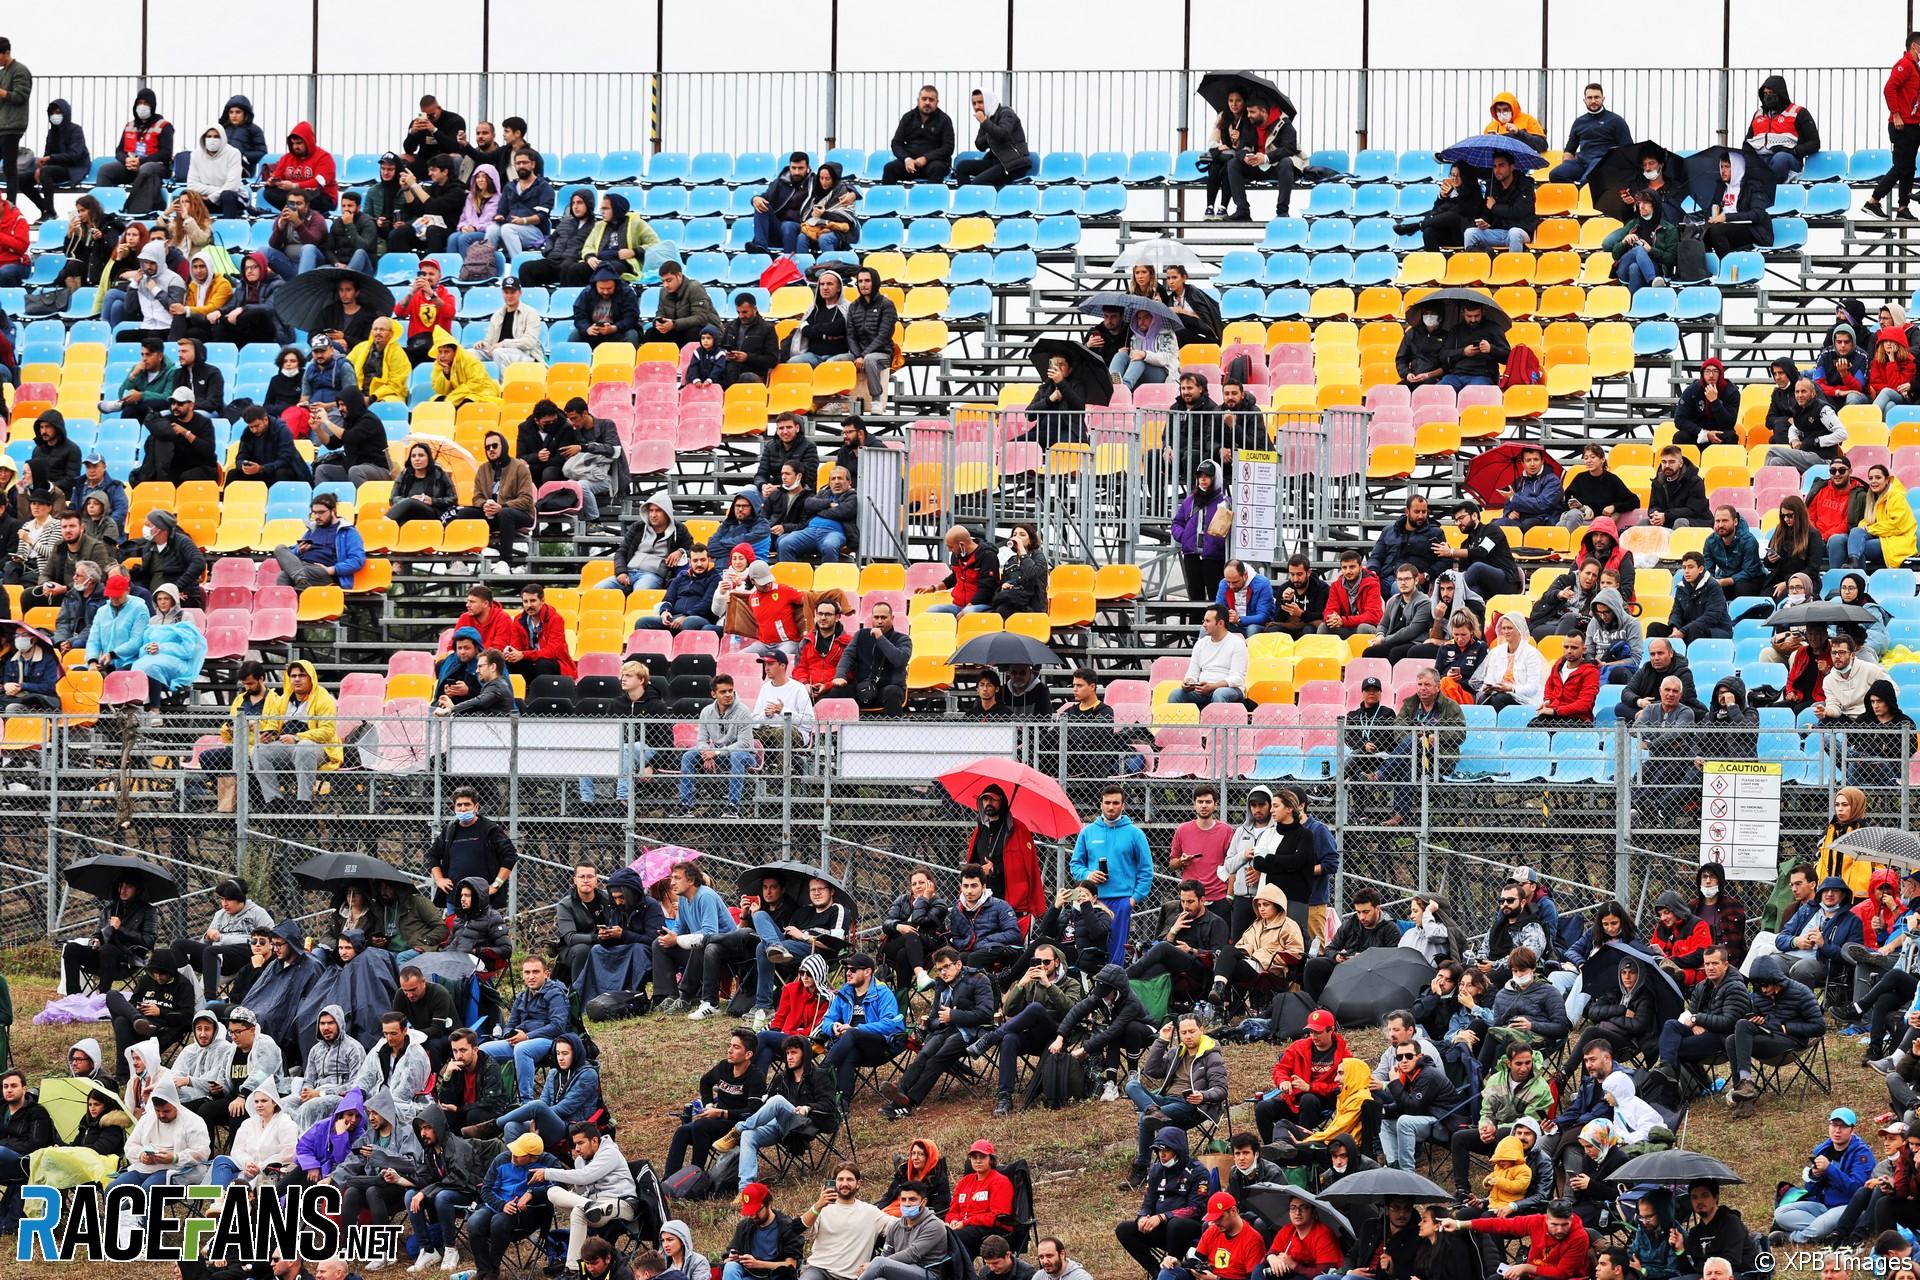 Spectators, Istanbul Park, 2021